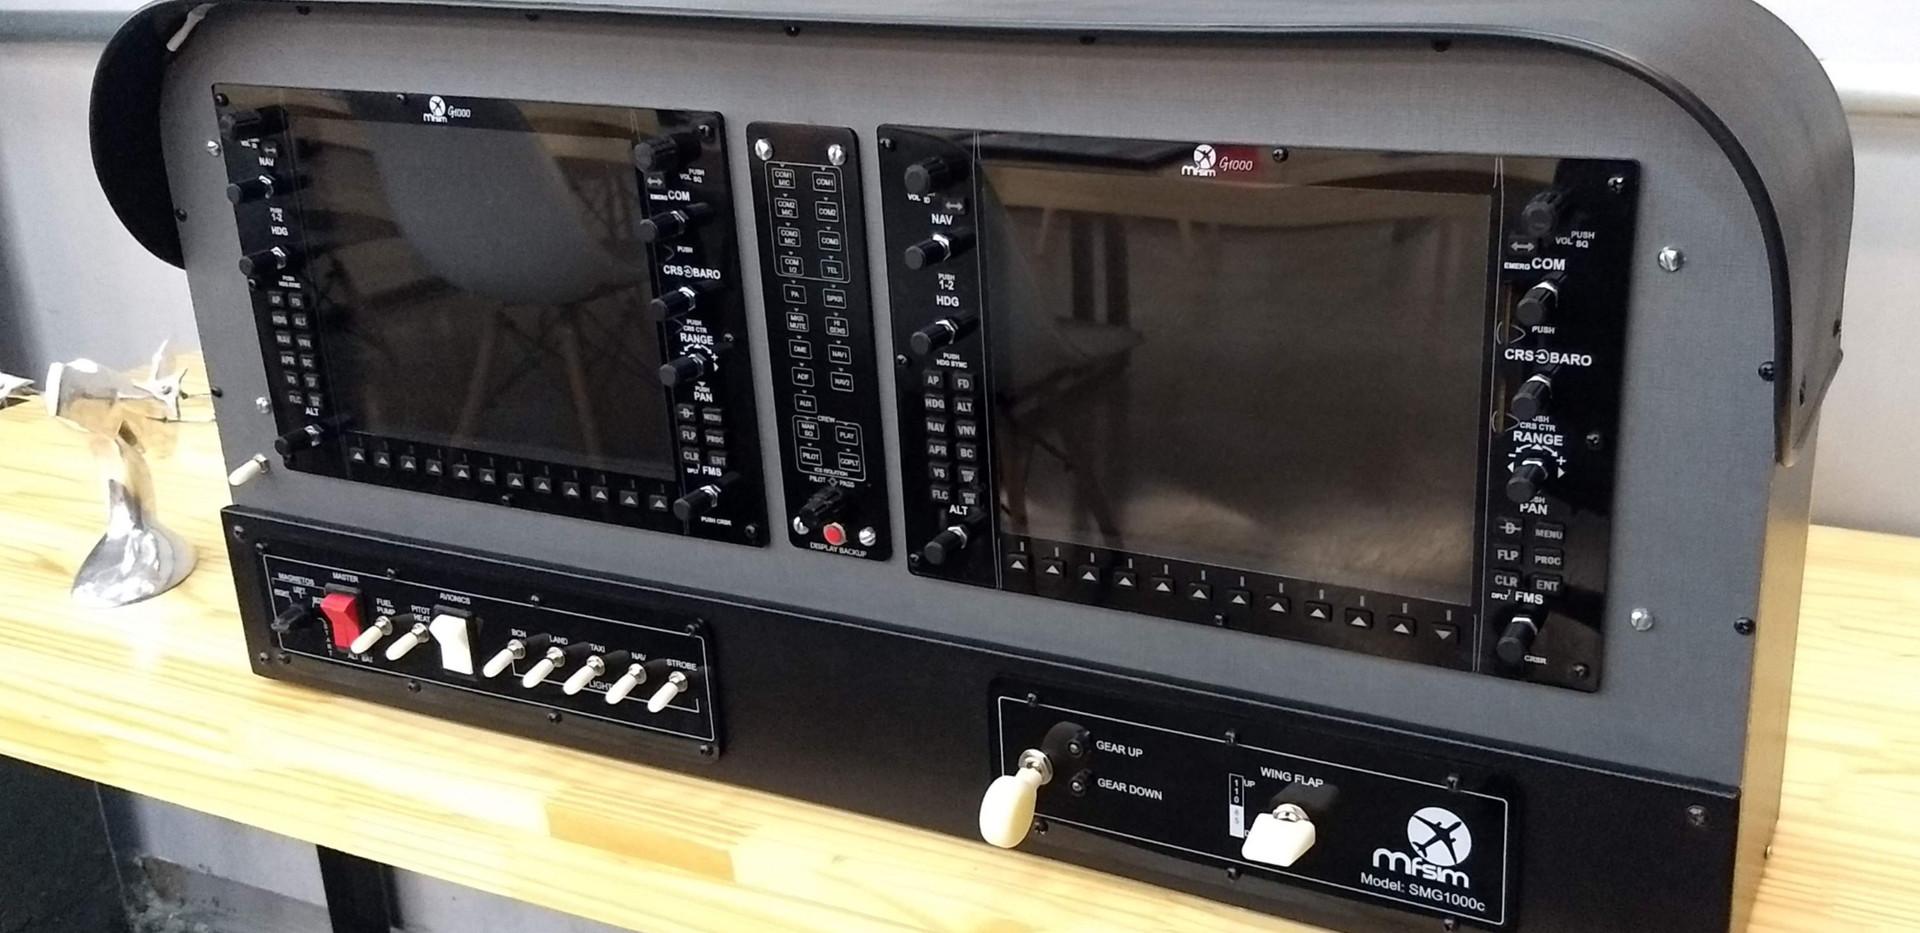 MFSim G1000 Panel